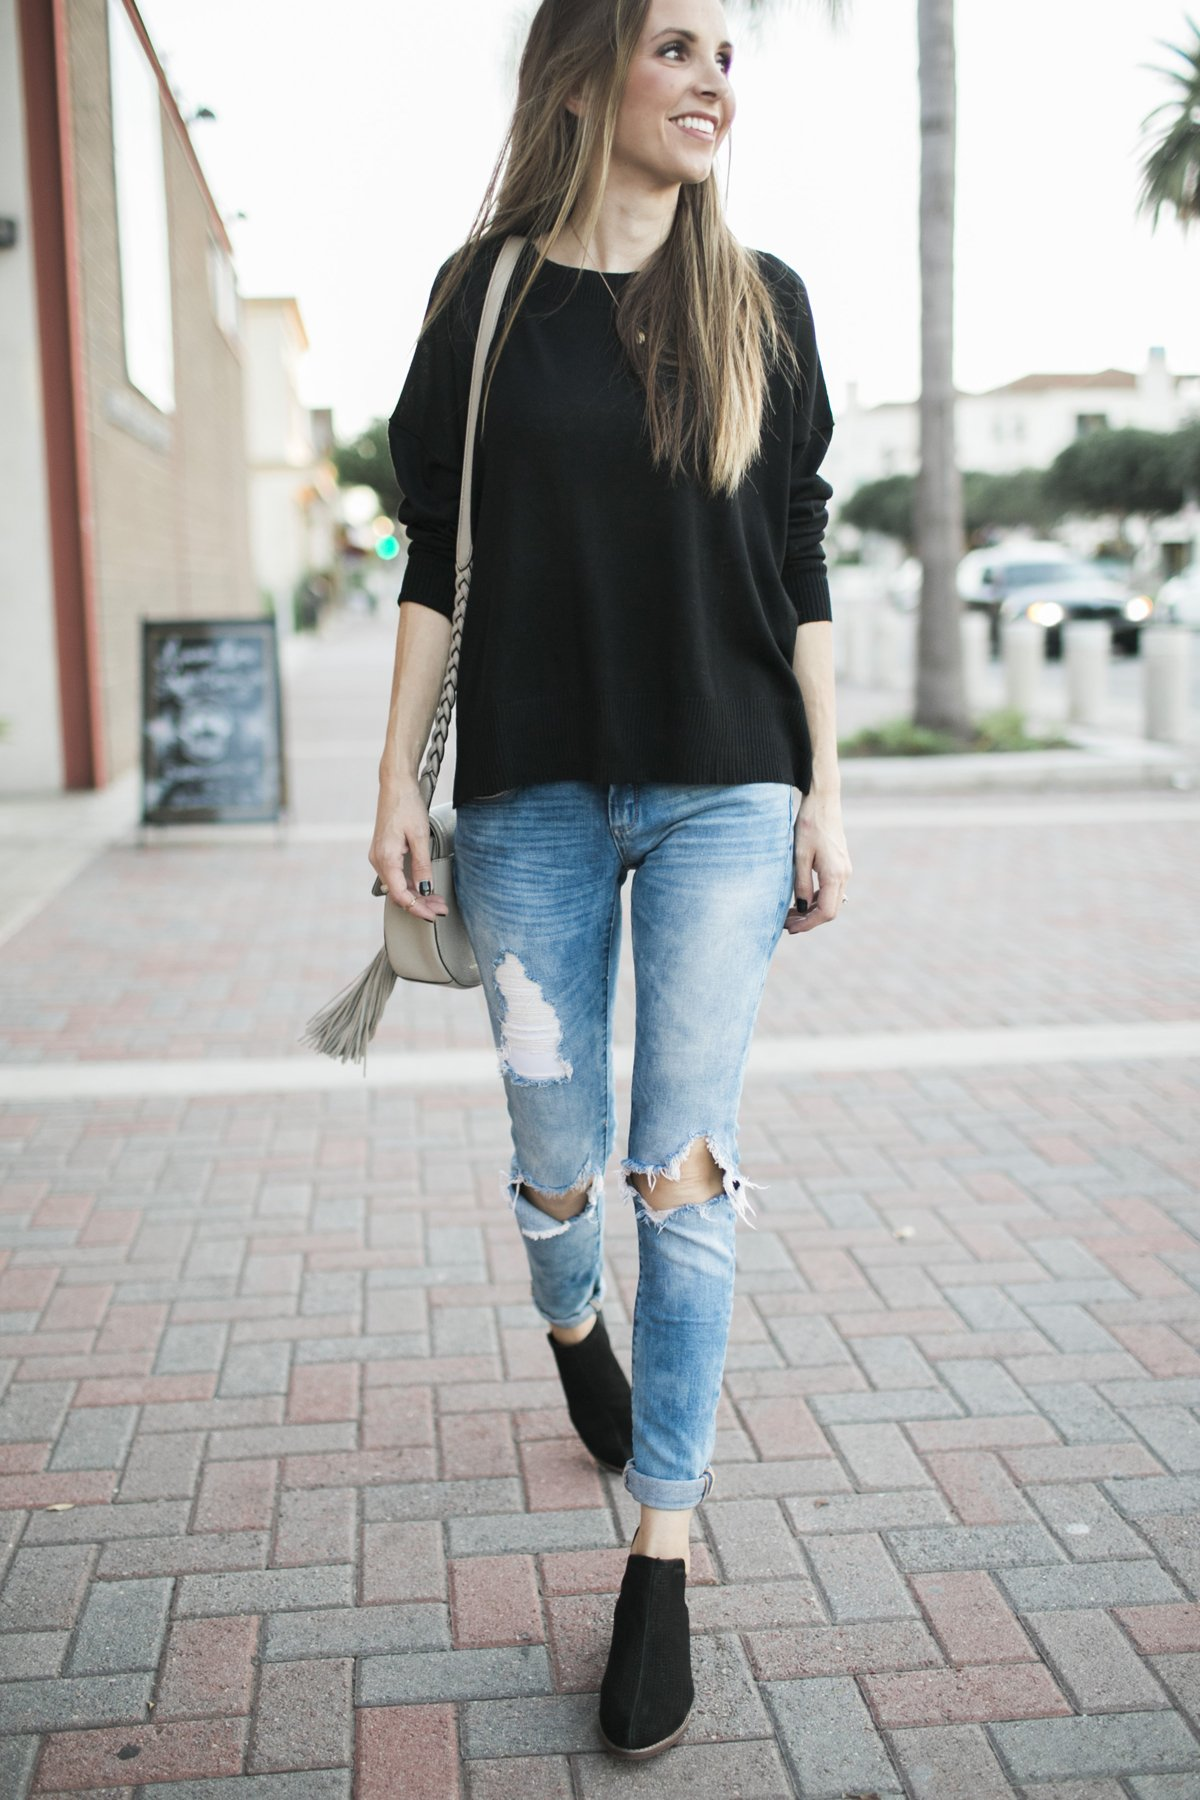 merricks-art-boyfriend-jeans-black-sweater